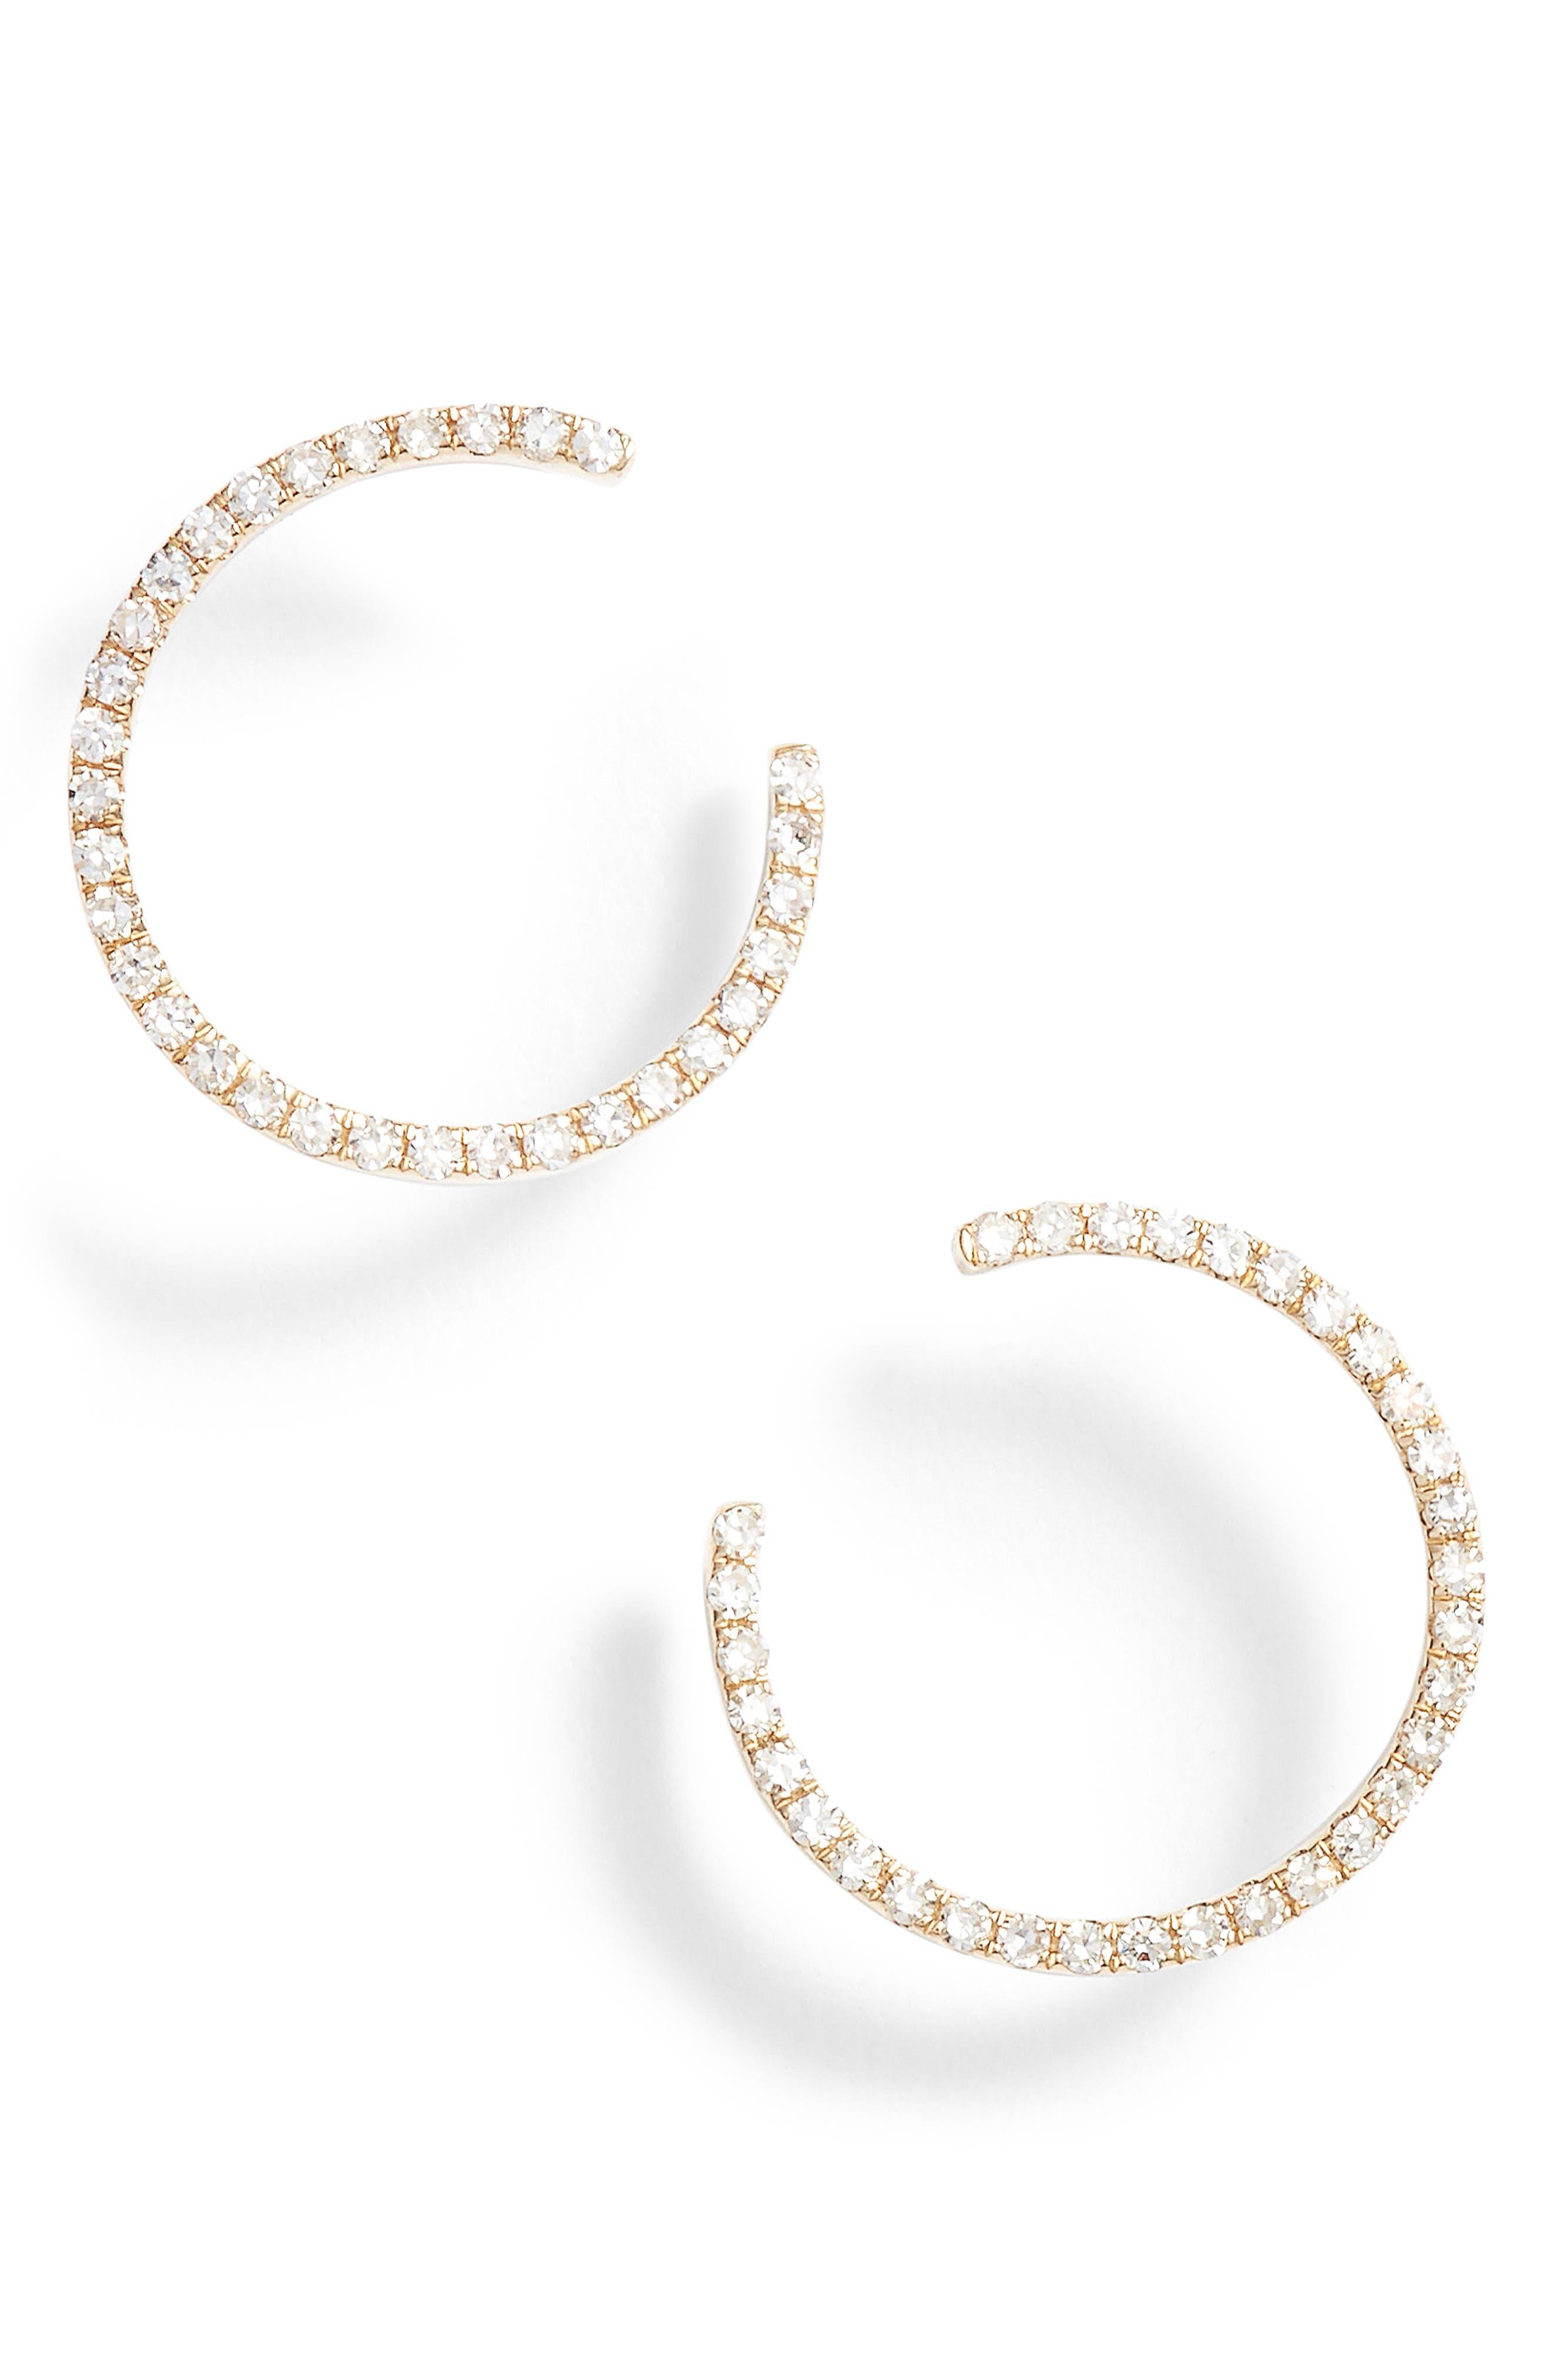 Diamond Illusion Hoop Earrings,                         Main,                         color, Yellow Gold